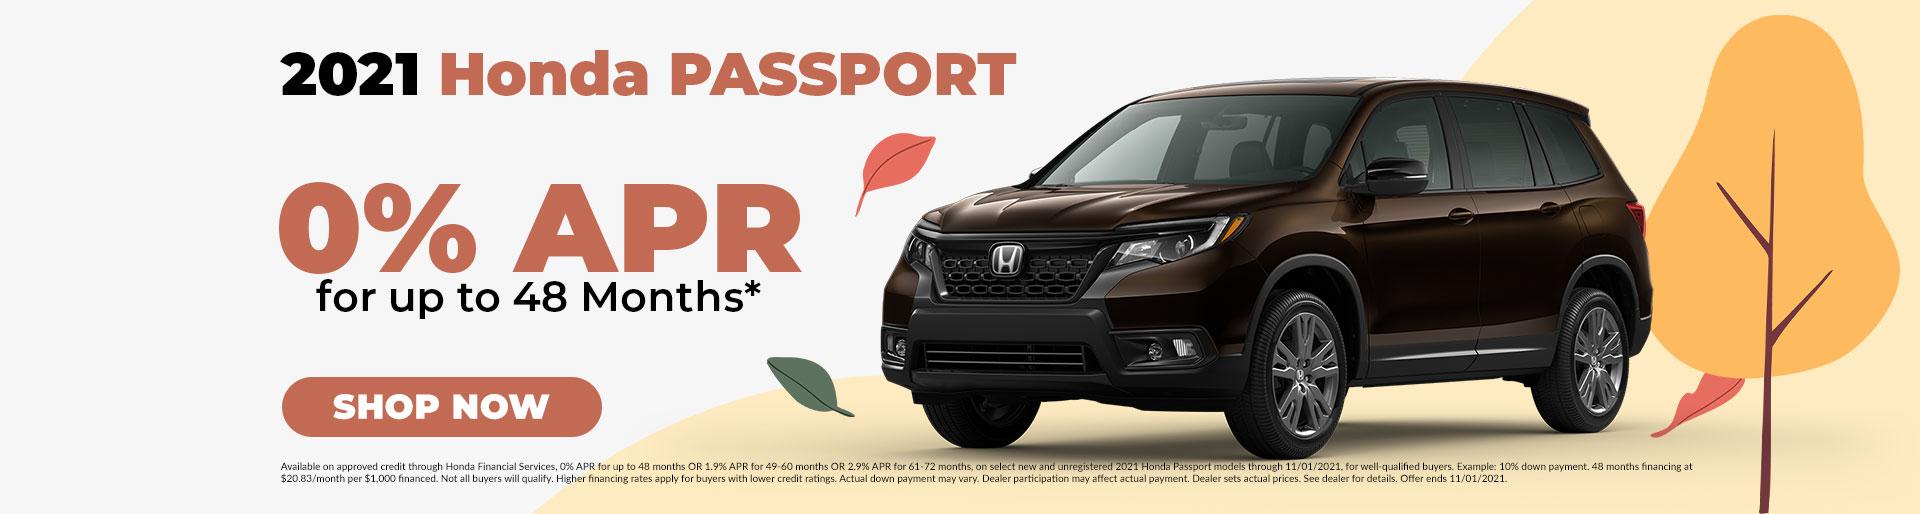 2021 Honda Passport Offer in Jefferson City, MO